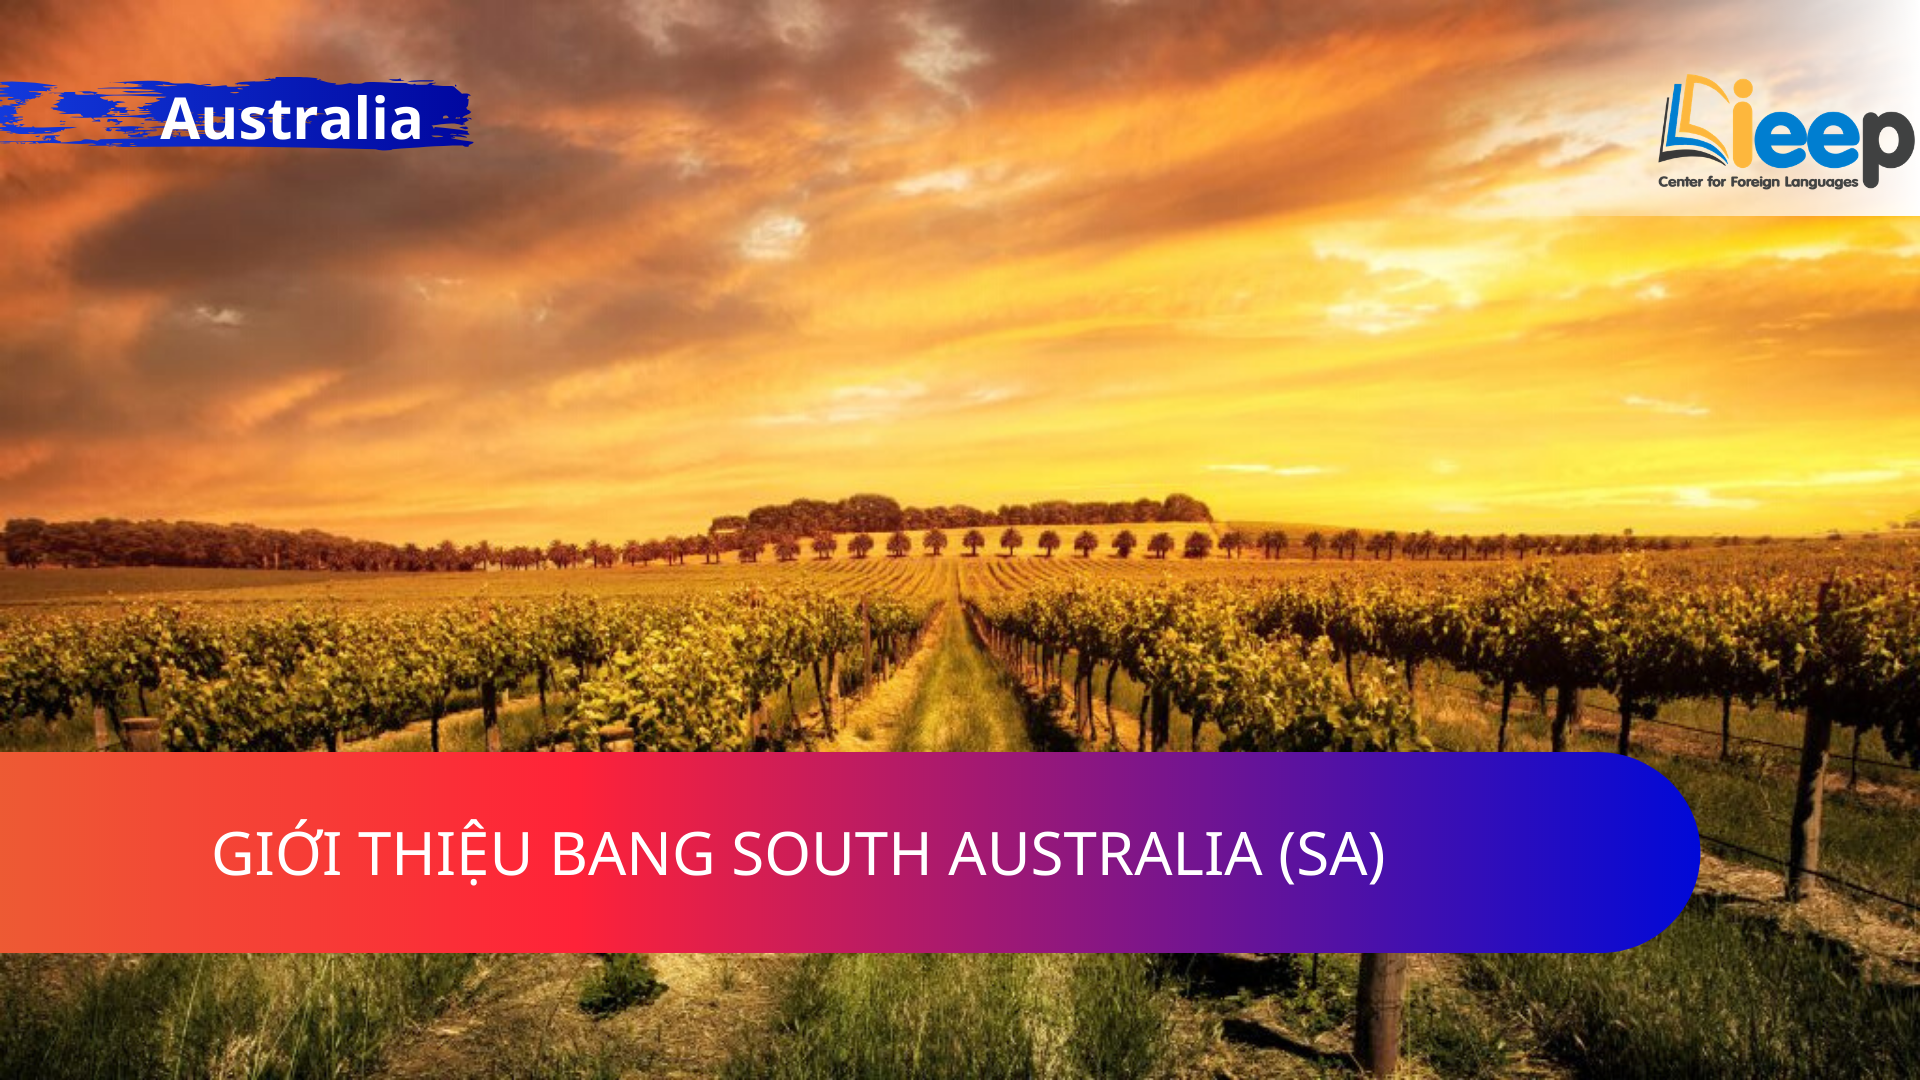 GIỚI THIỆU BANG SOUTH AUSTRALIA